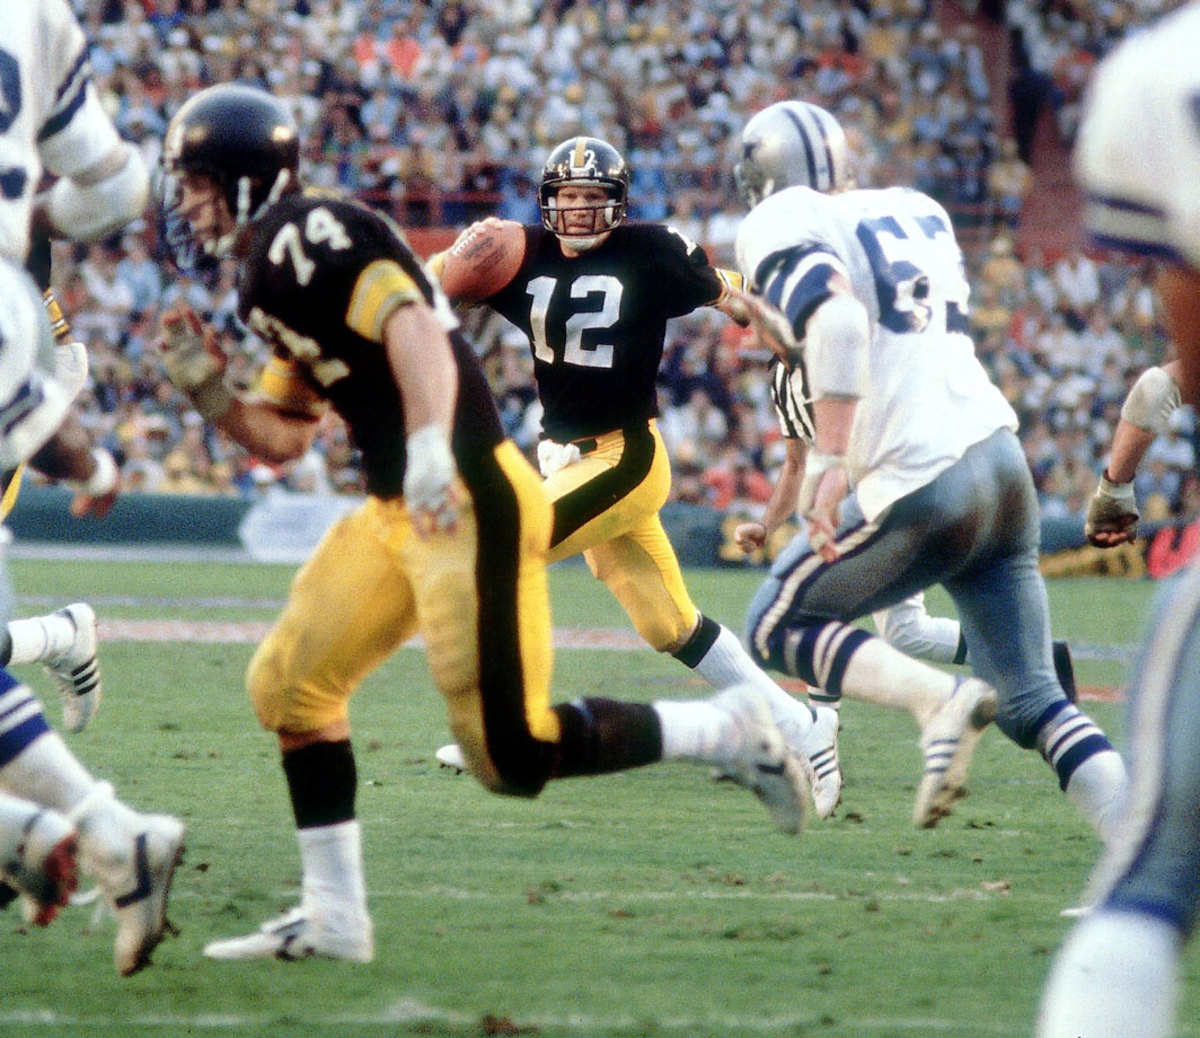 1979-0129-Super-Bowl-XIII-Terry-Bradshaw-001344521.jpg